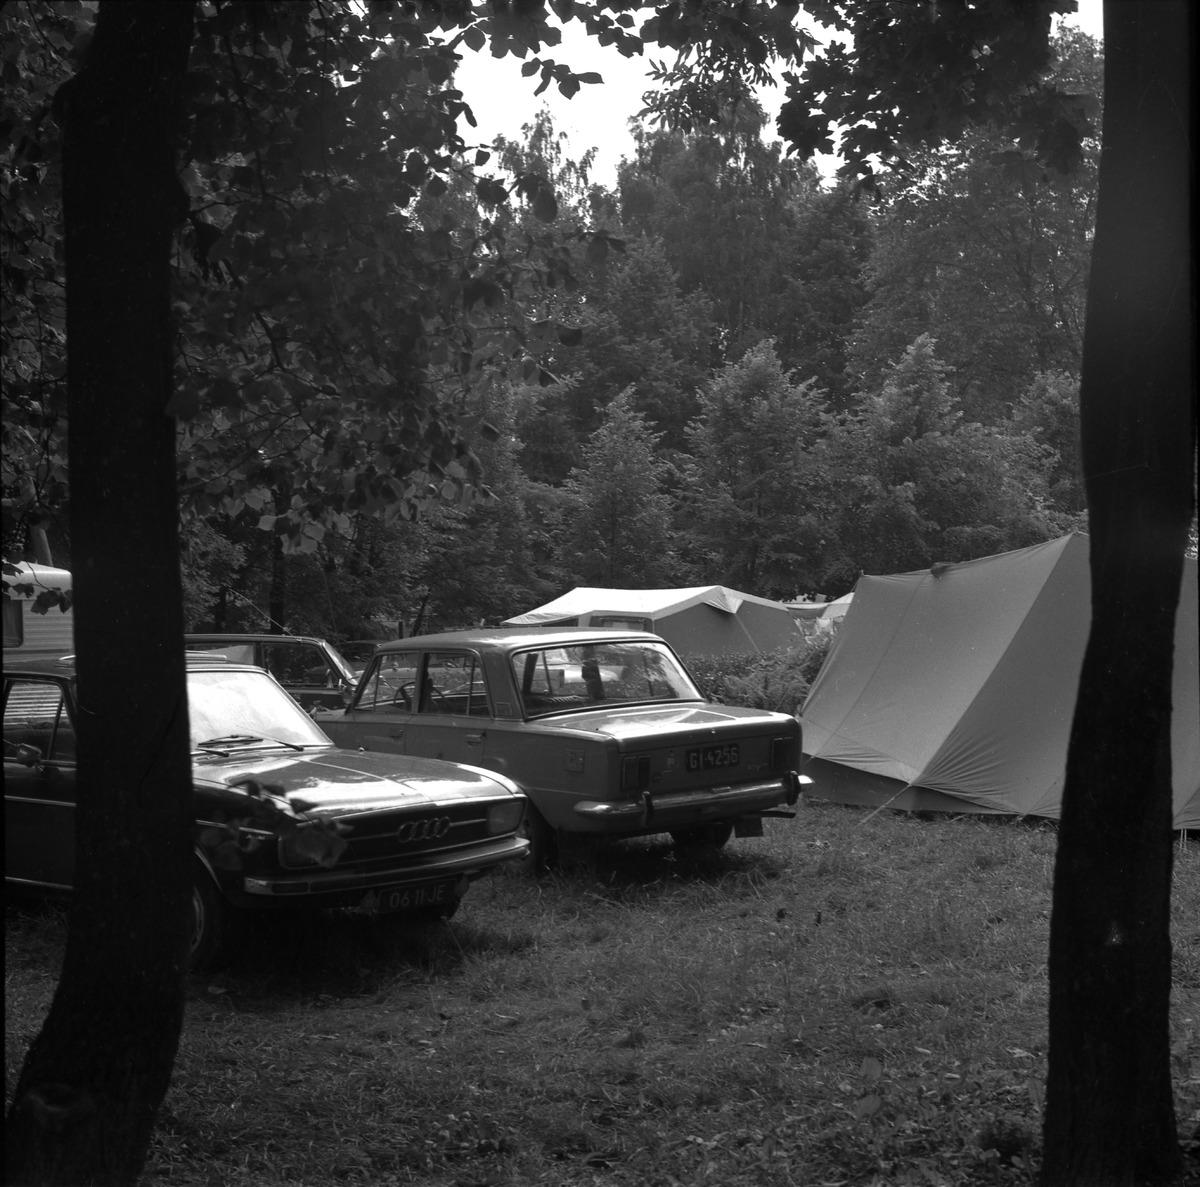 Camping przy zamku [2]